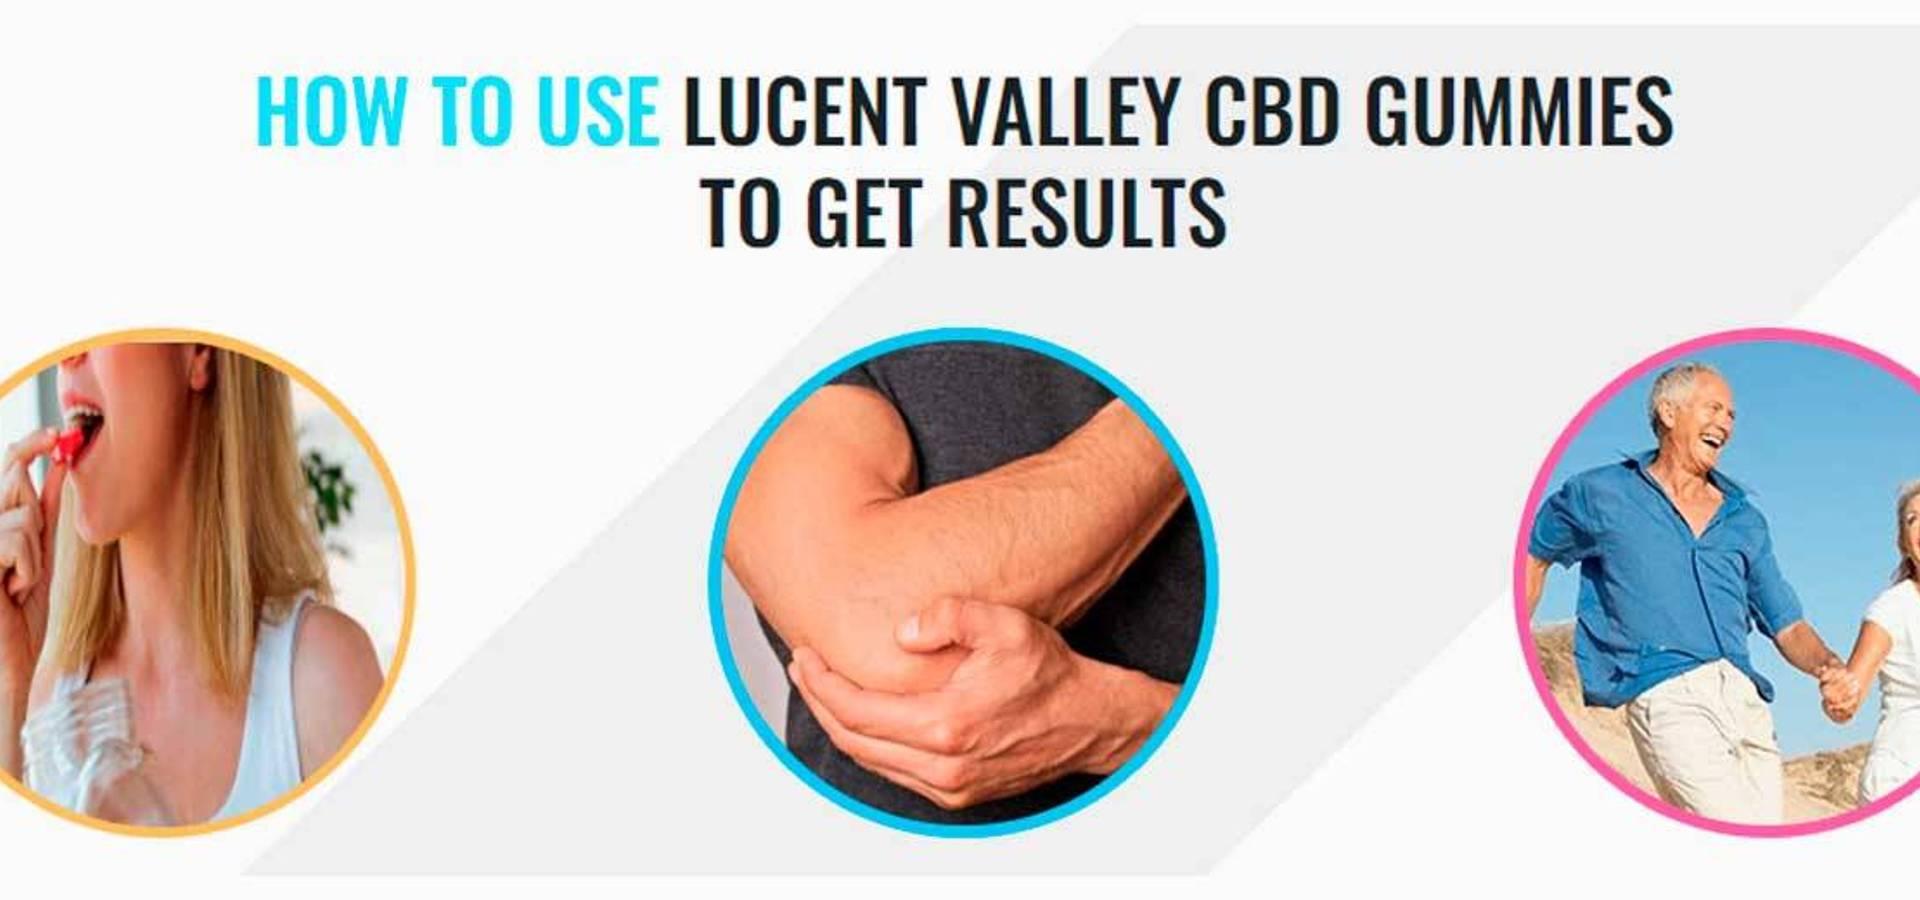 Lucent Valley CBD Gummies Price